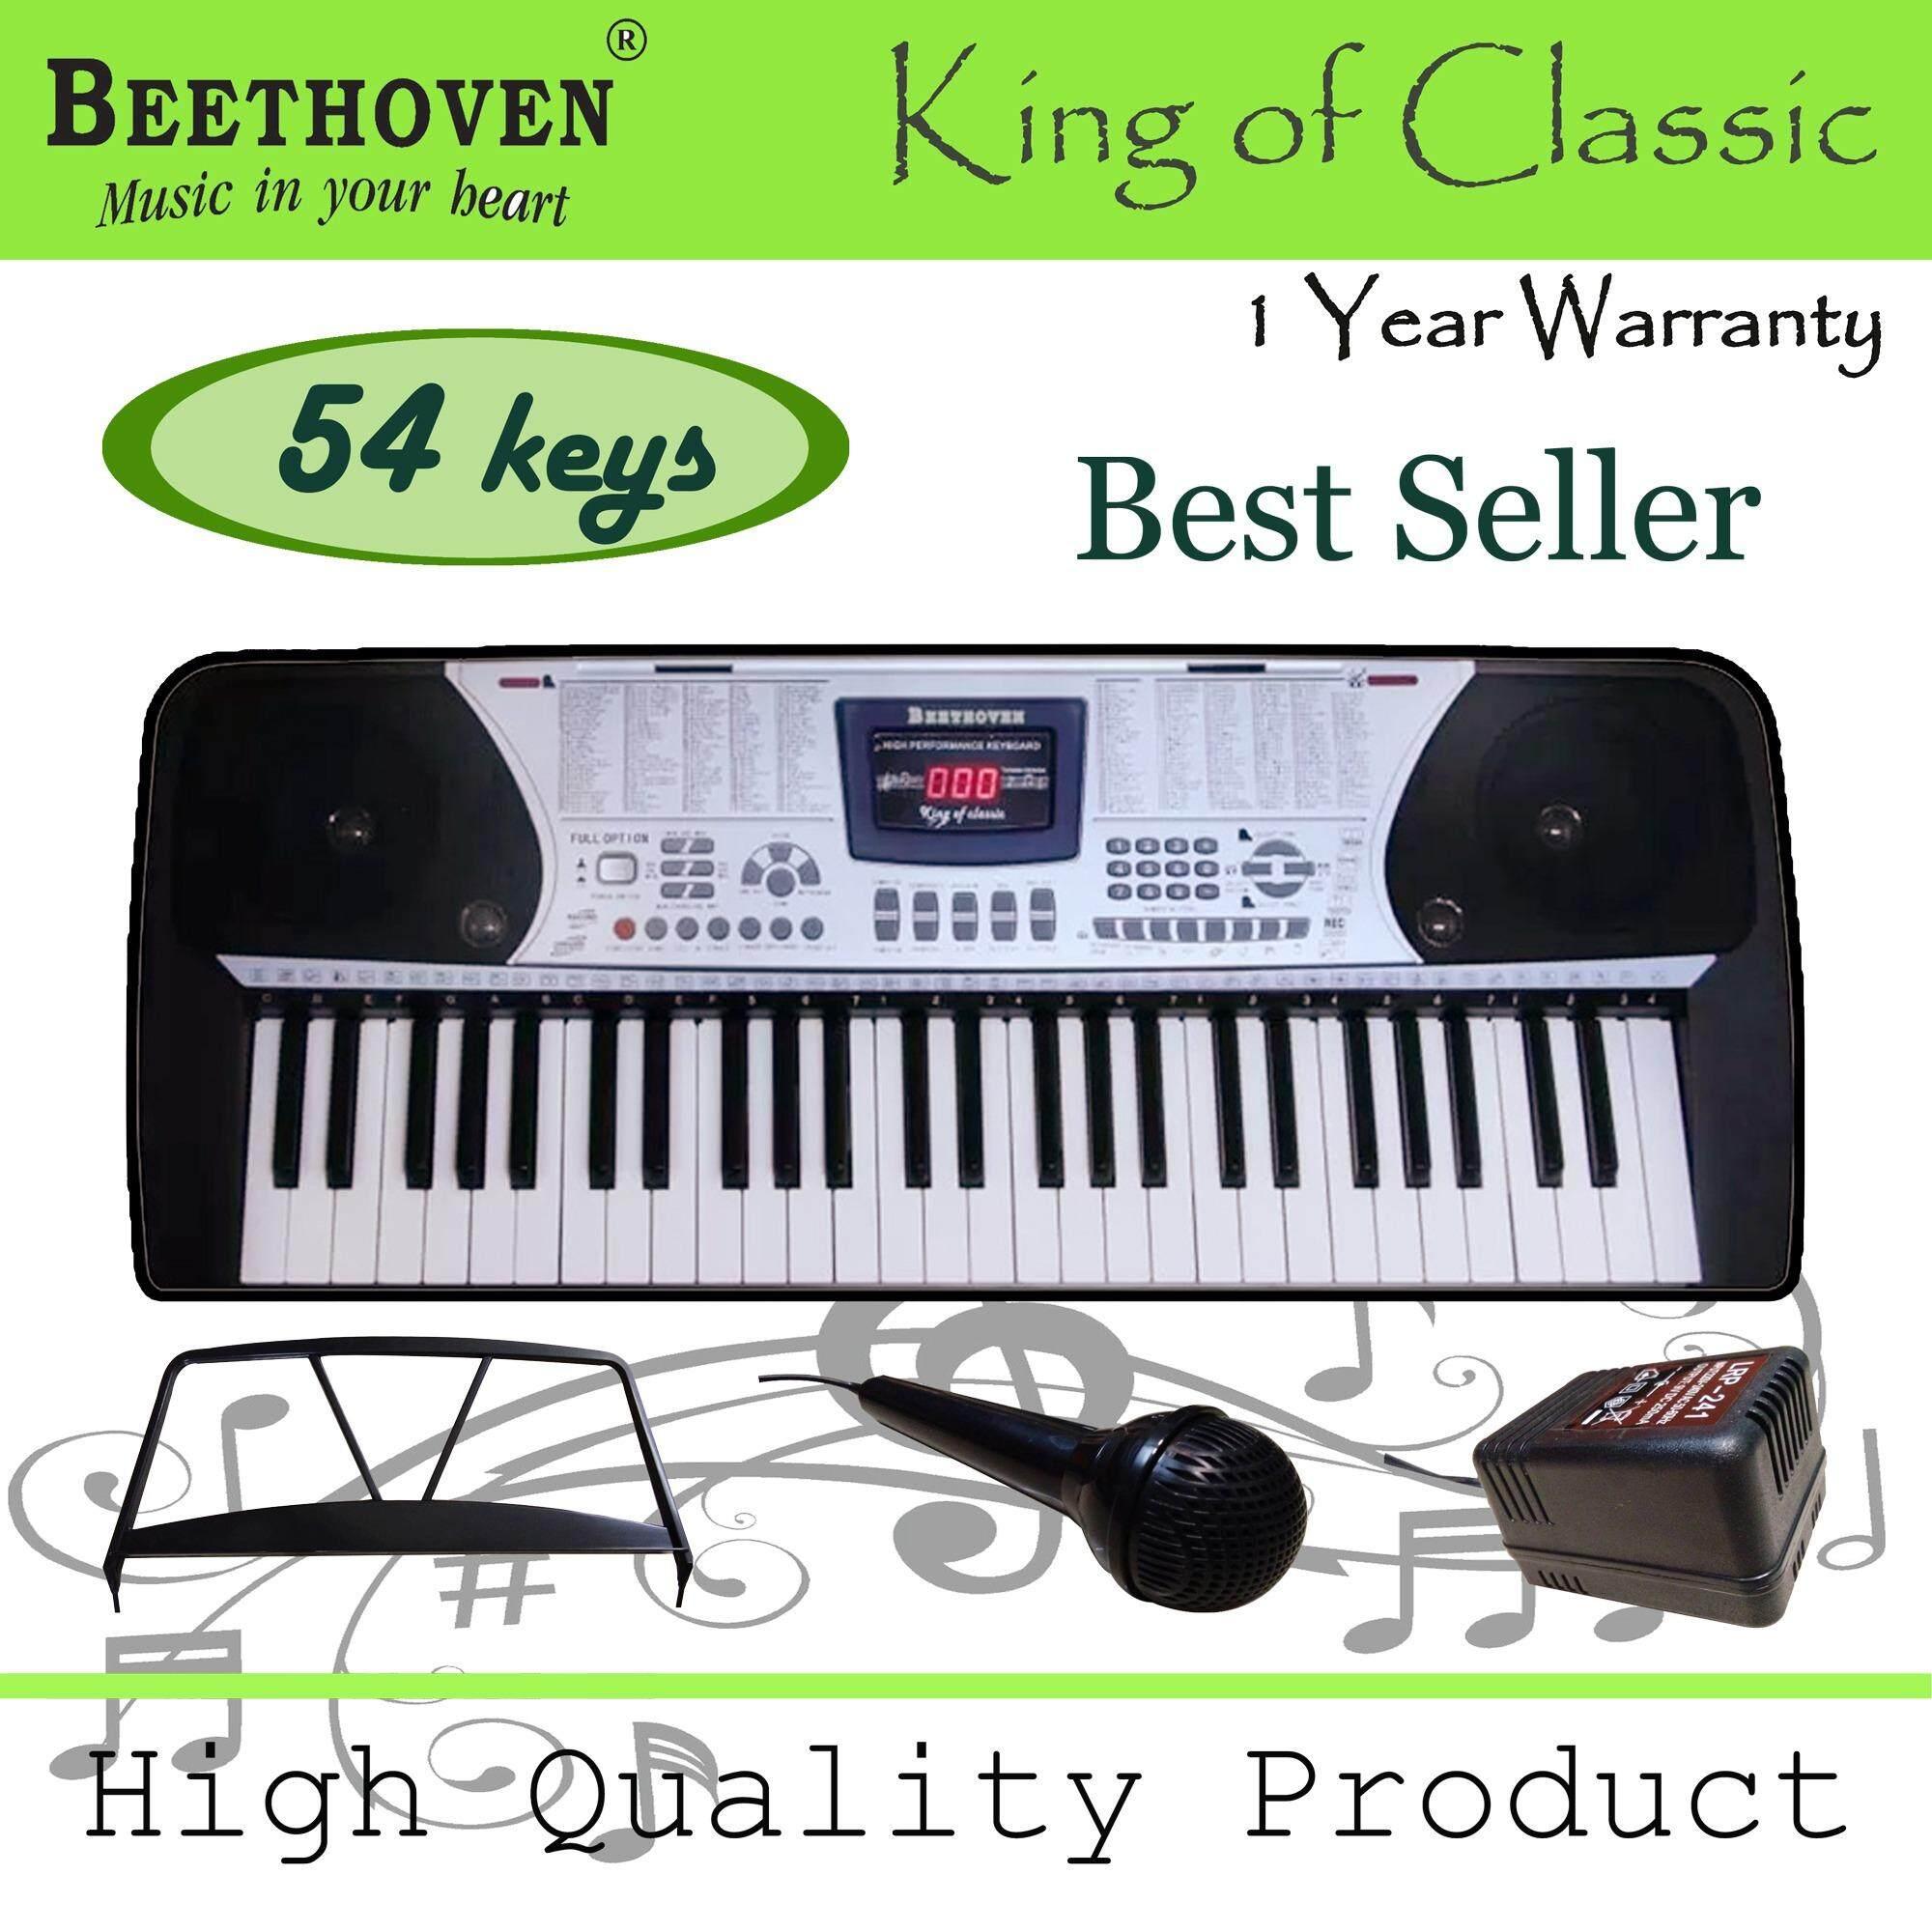 Beethoven คีย์บอร์ด 54 คีย์มาตรฐาน รุ่น King Of Classic (Full Option) แถมฟรี แท่นวางโน๊ต ไมค์ อแดปเตอร์ โน๊ต พร้อมรับประกัน 1 ปี!!